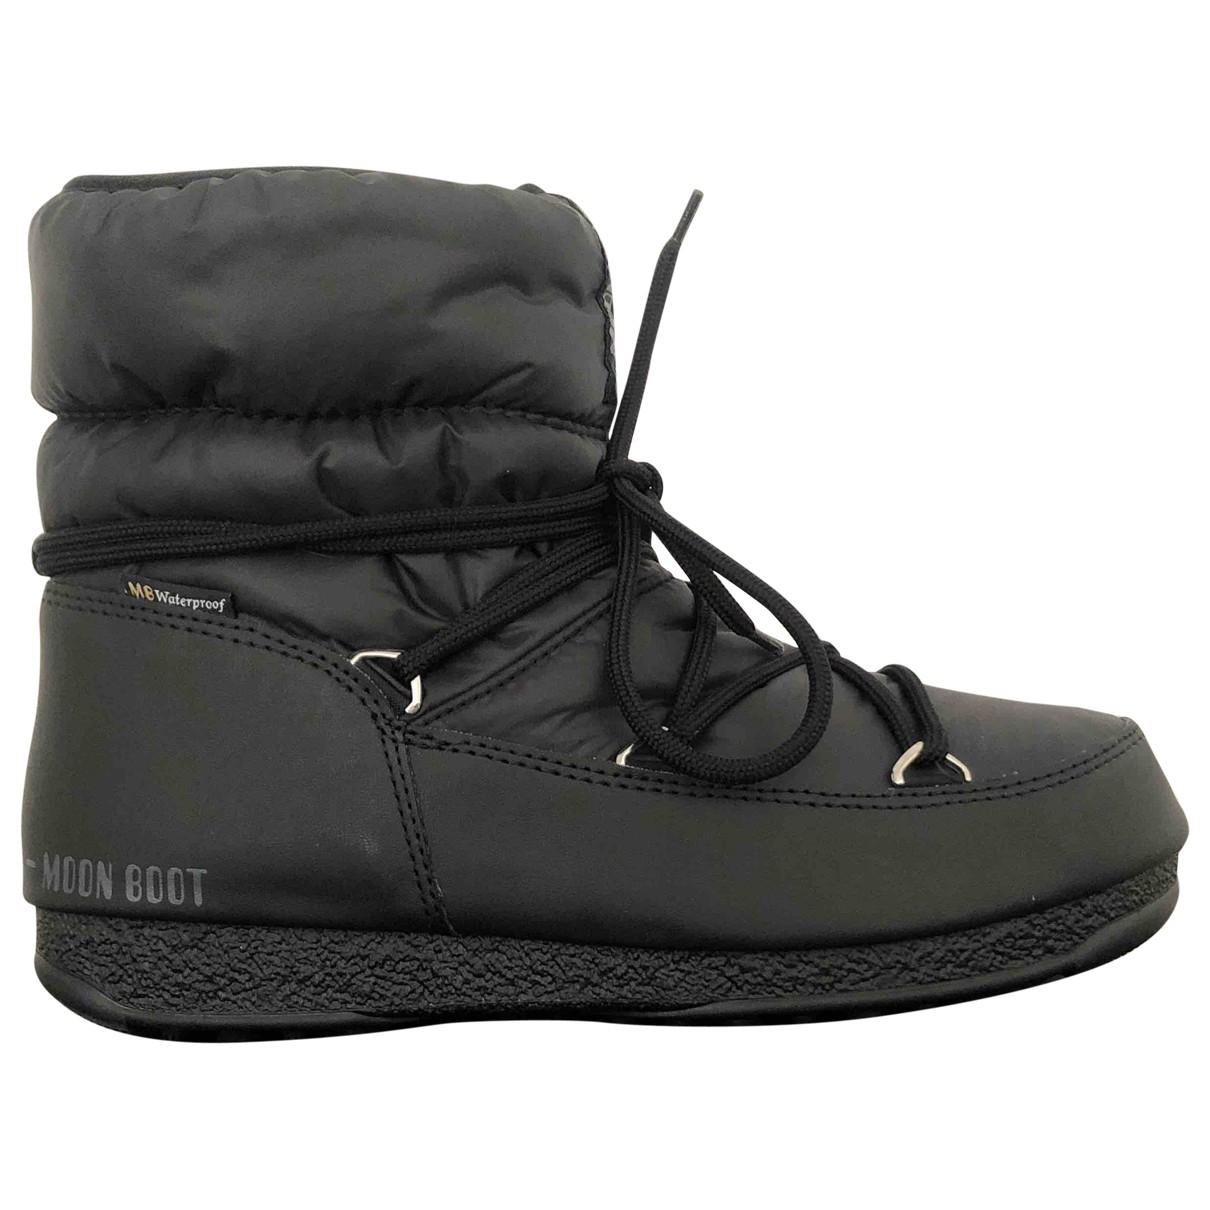 Moon Boot \N Stiefel in  Schwarz Polyester